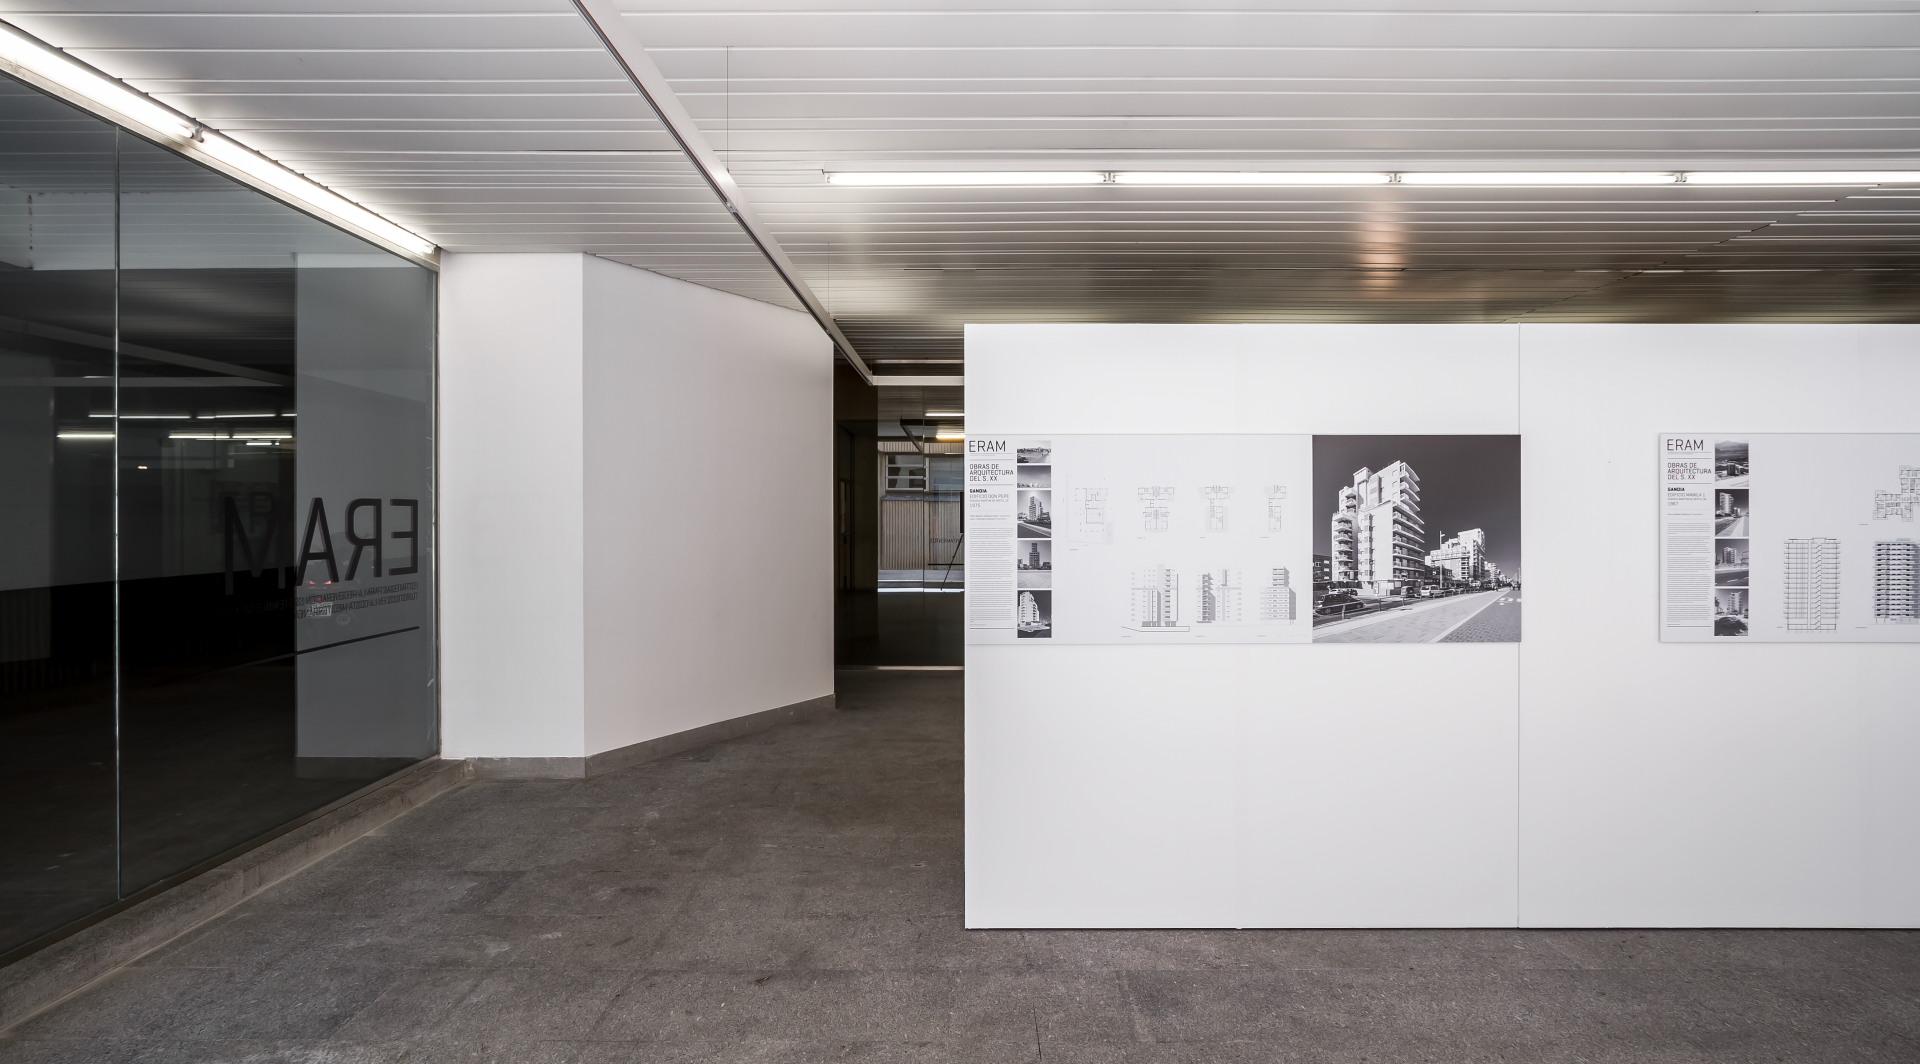 fotografia-arquitectura-valencia-german-cabo-upv-etsav-eram-exposicion (9)